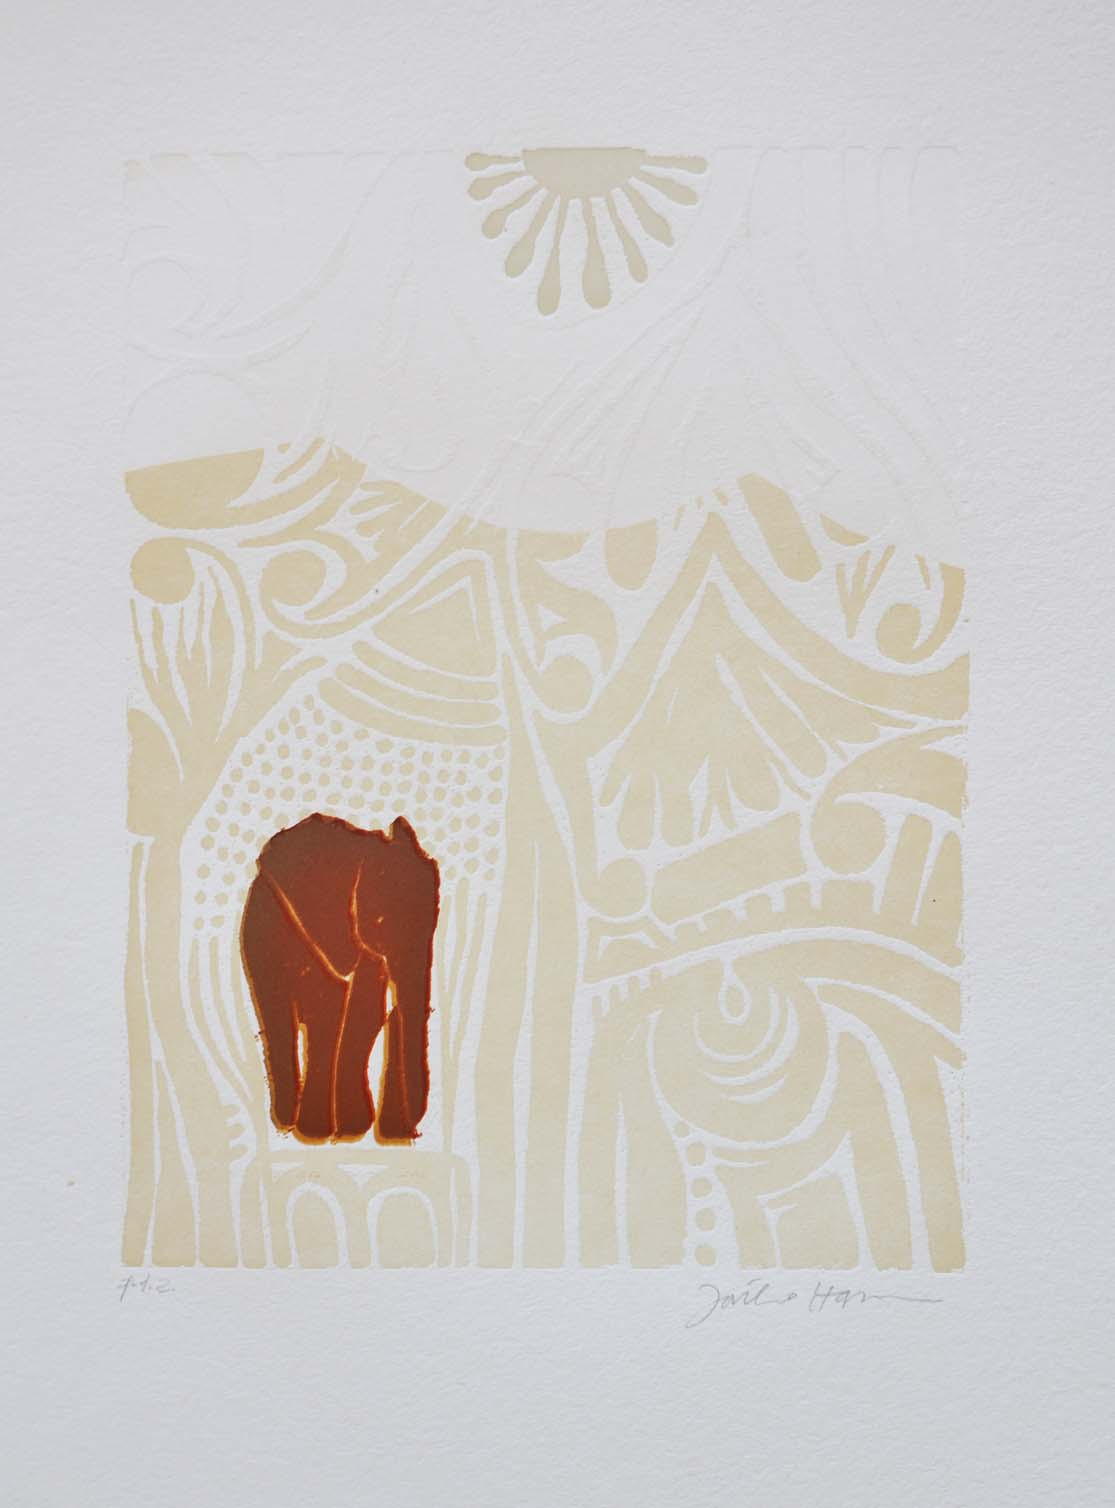 HASSAN FATHI, Africa I, Xilografia, Formato cm 70x50